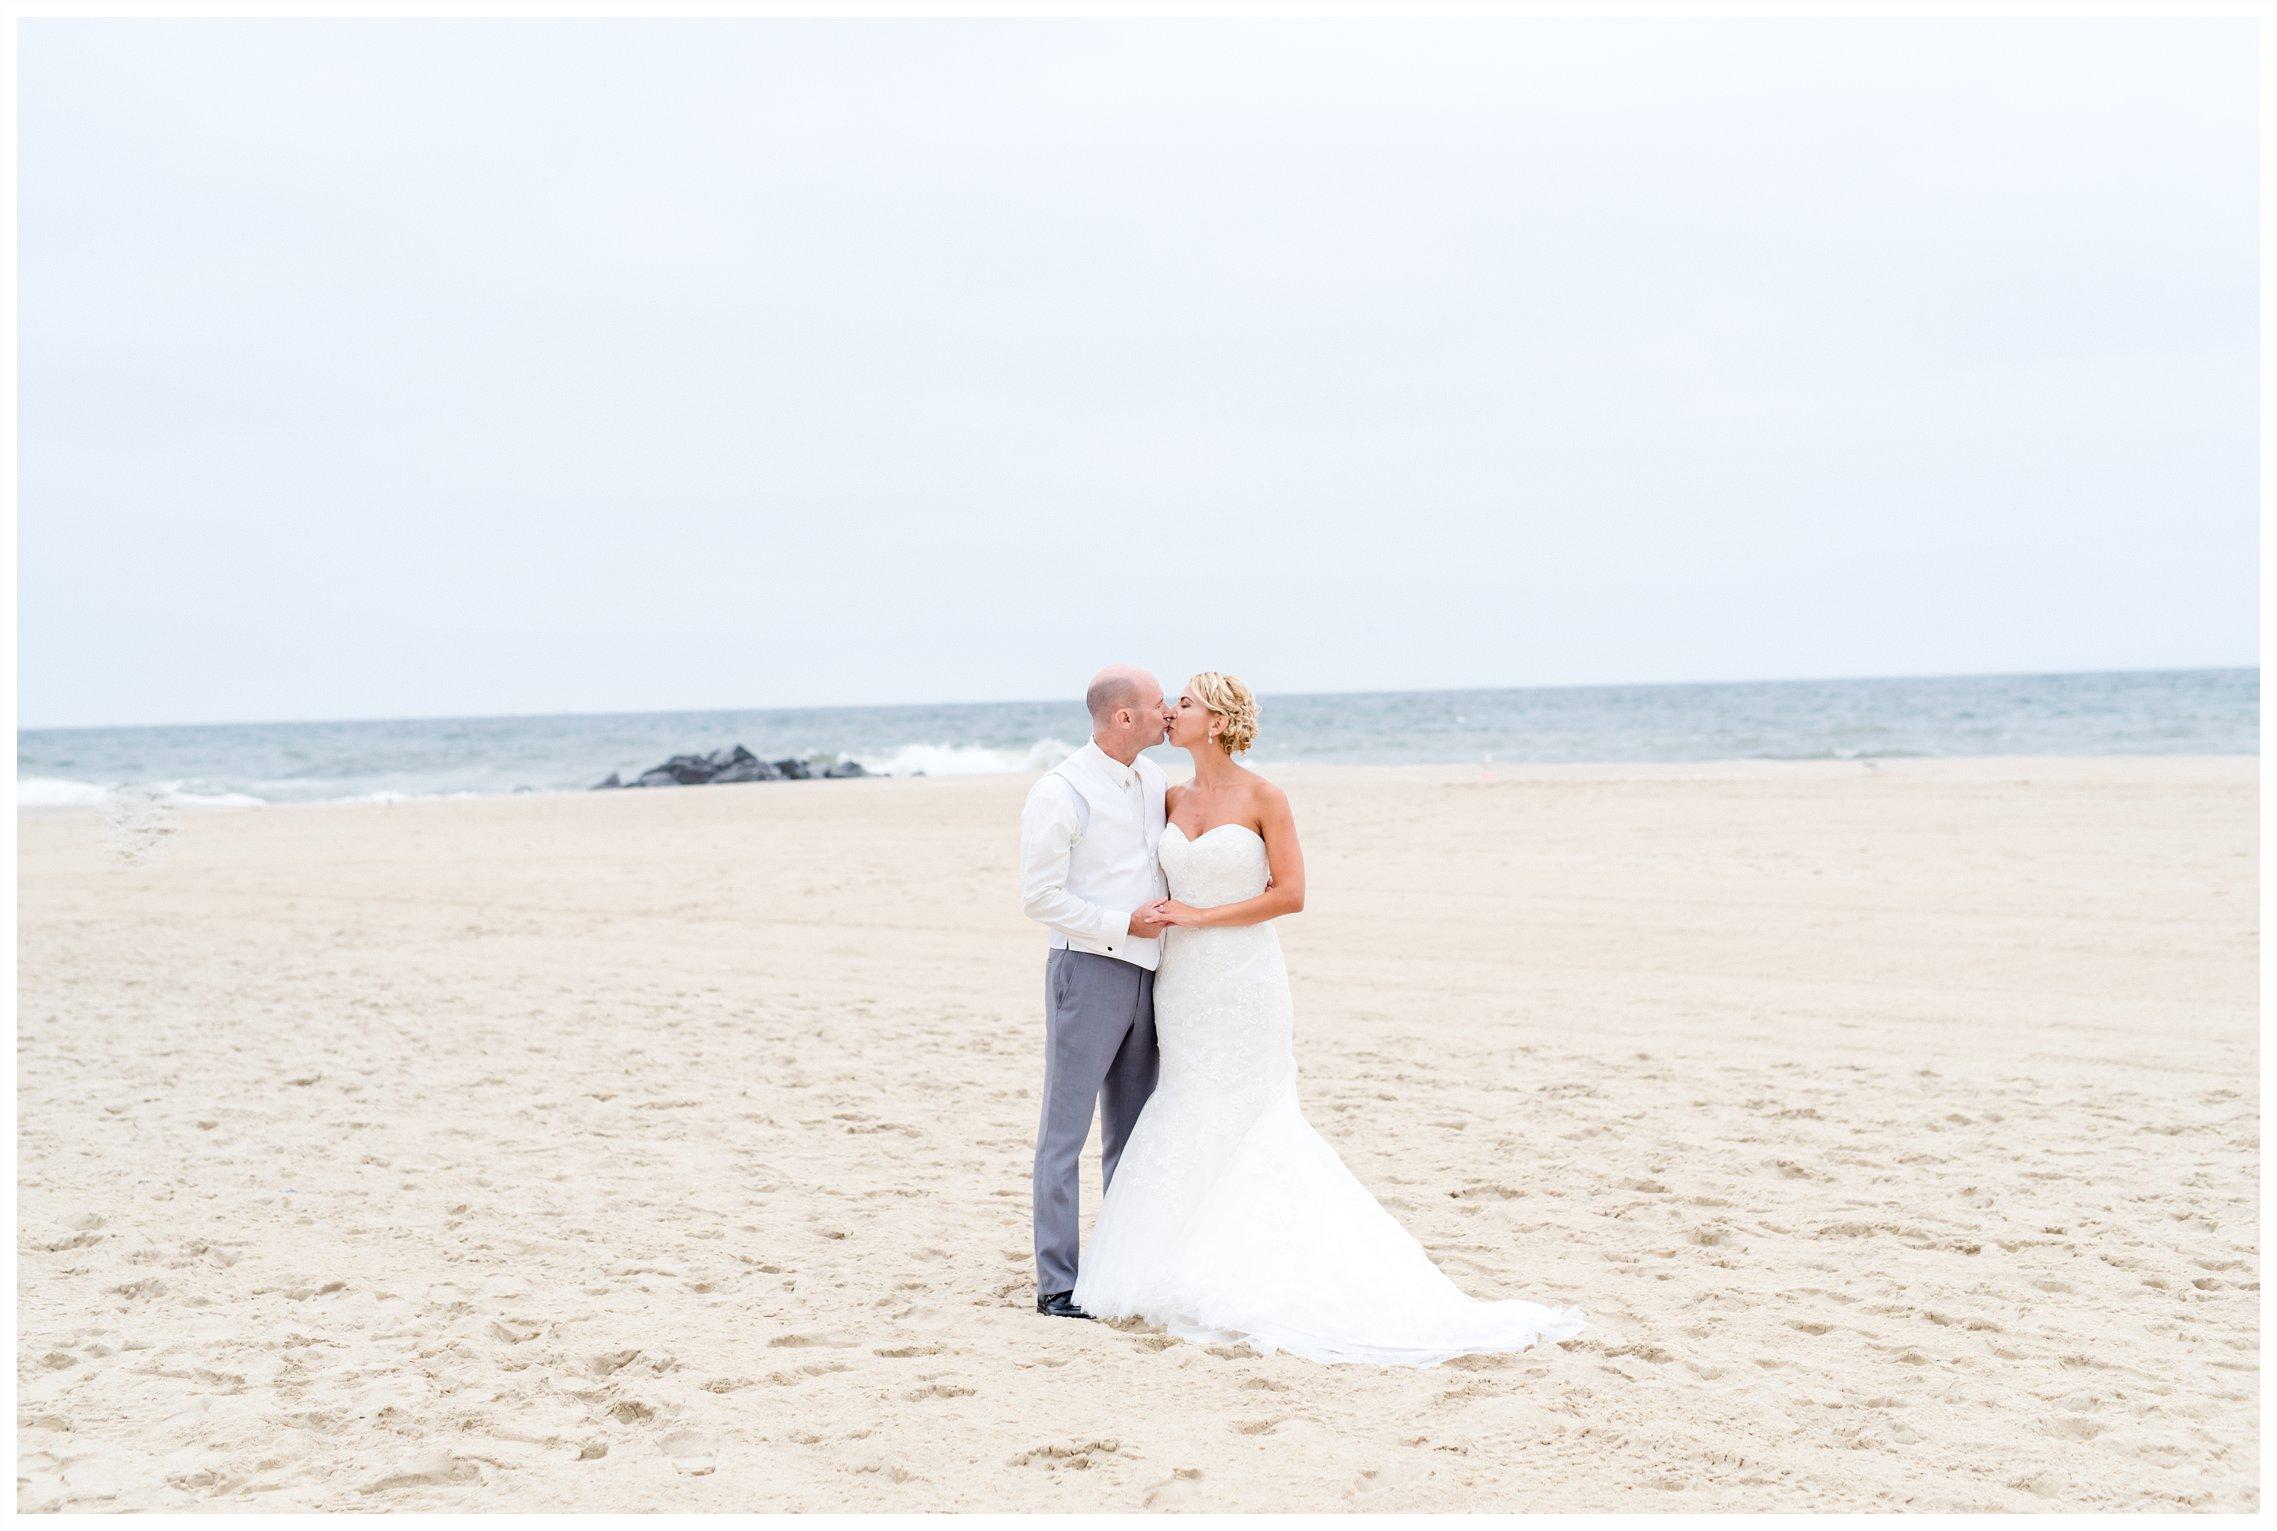 McLoone's beach wedding